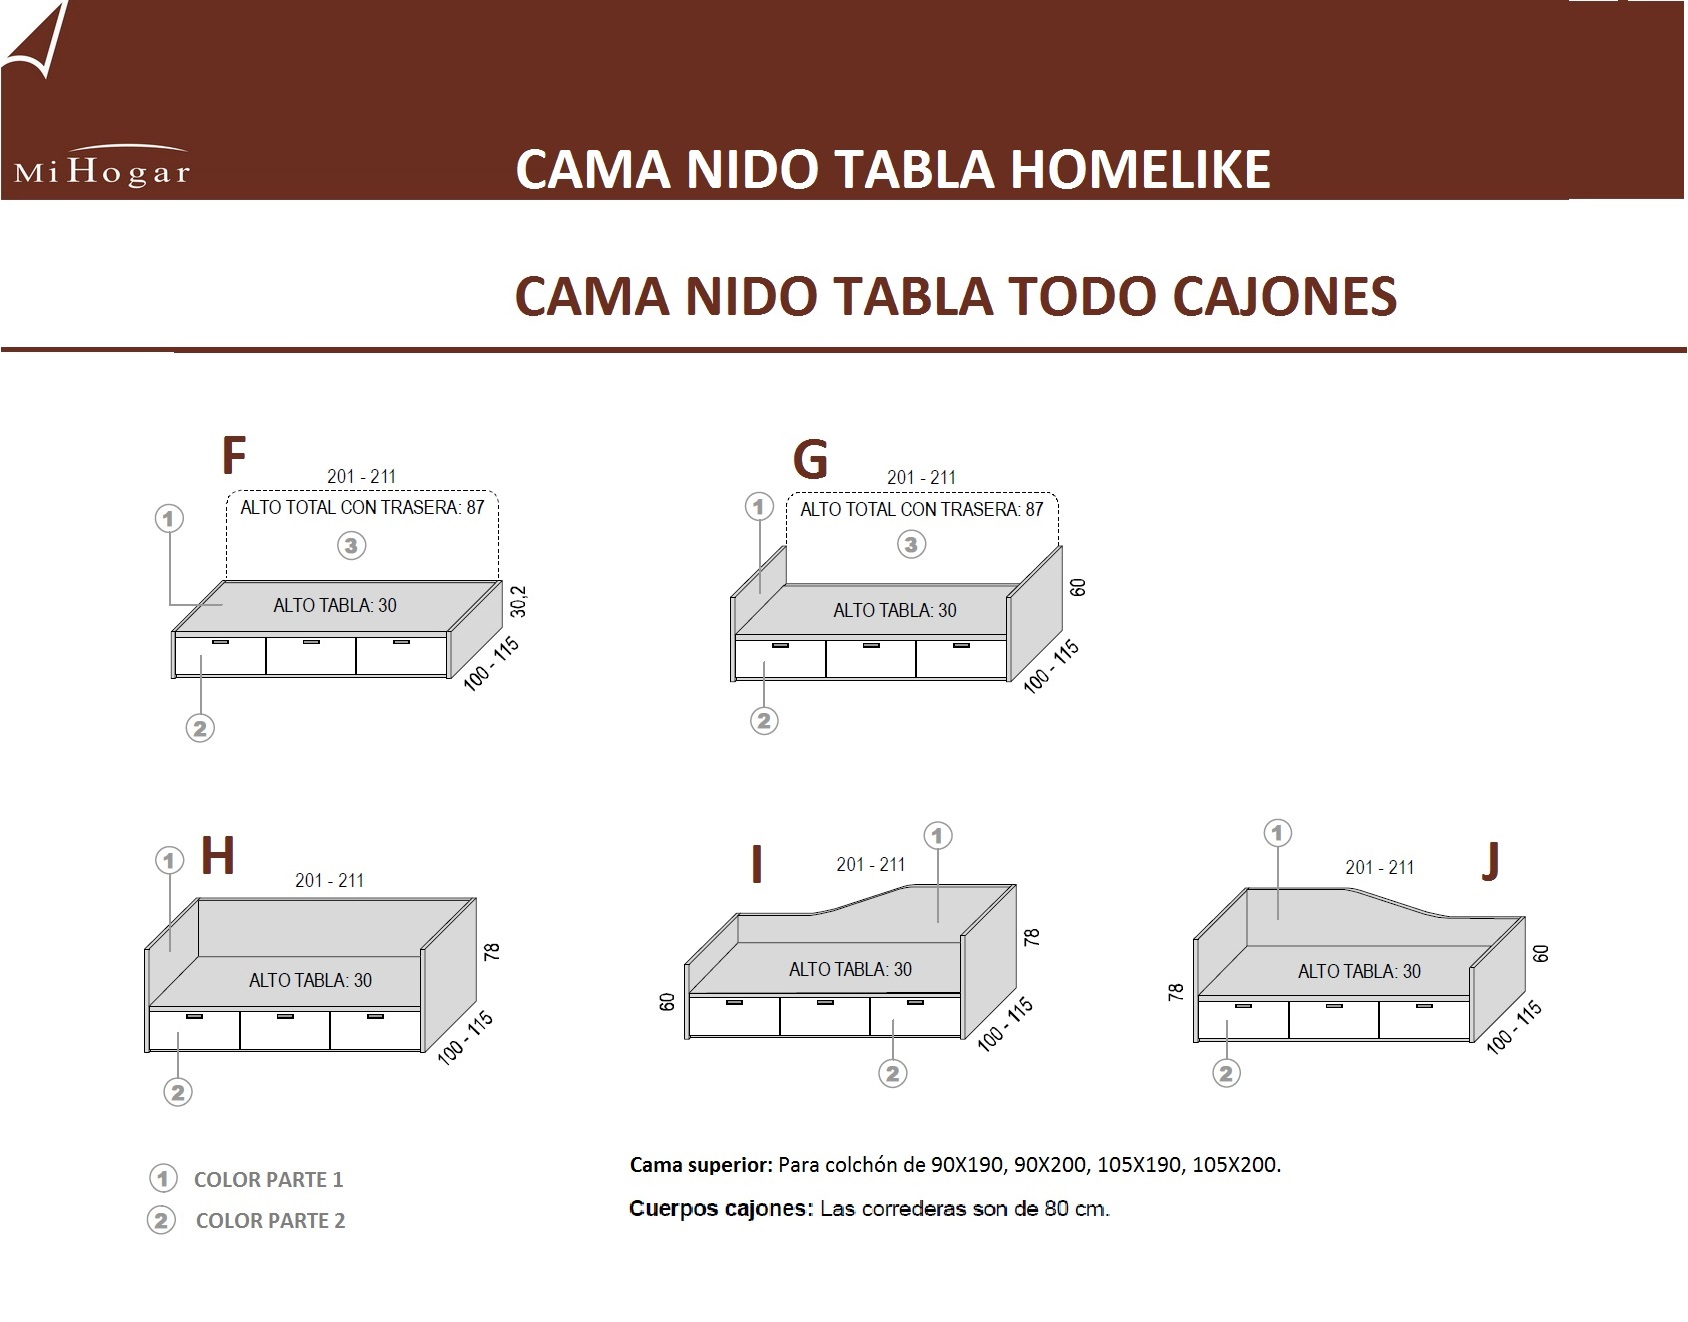 Cama nido tabla homelike muebles mi hogar for Dimensiones cama nido